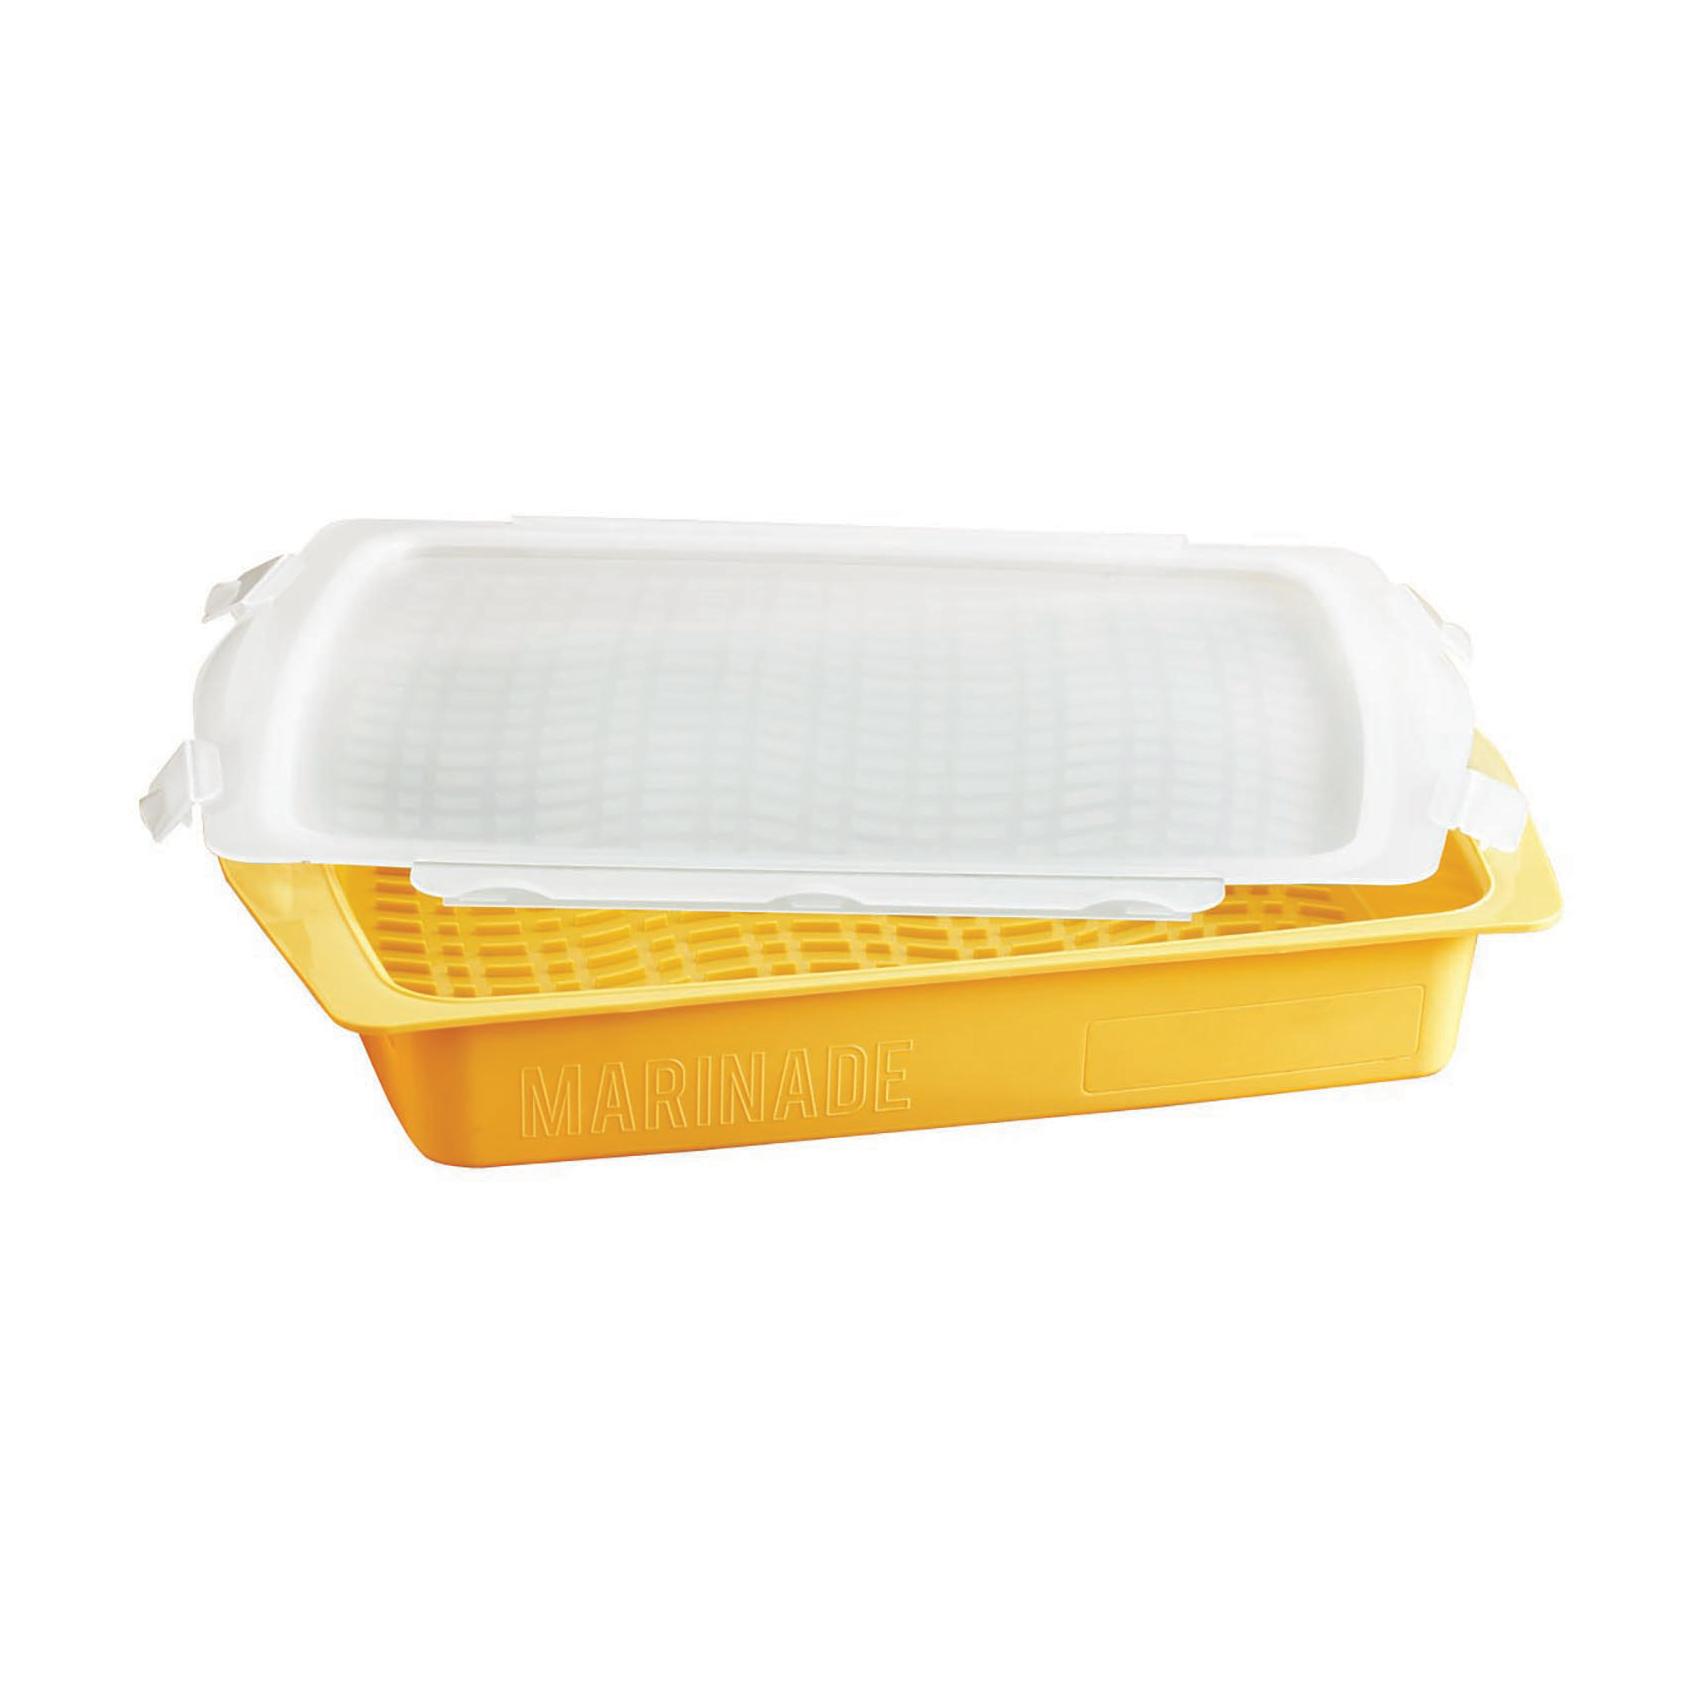 Chef Master 40252Y food storage container, box